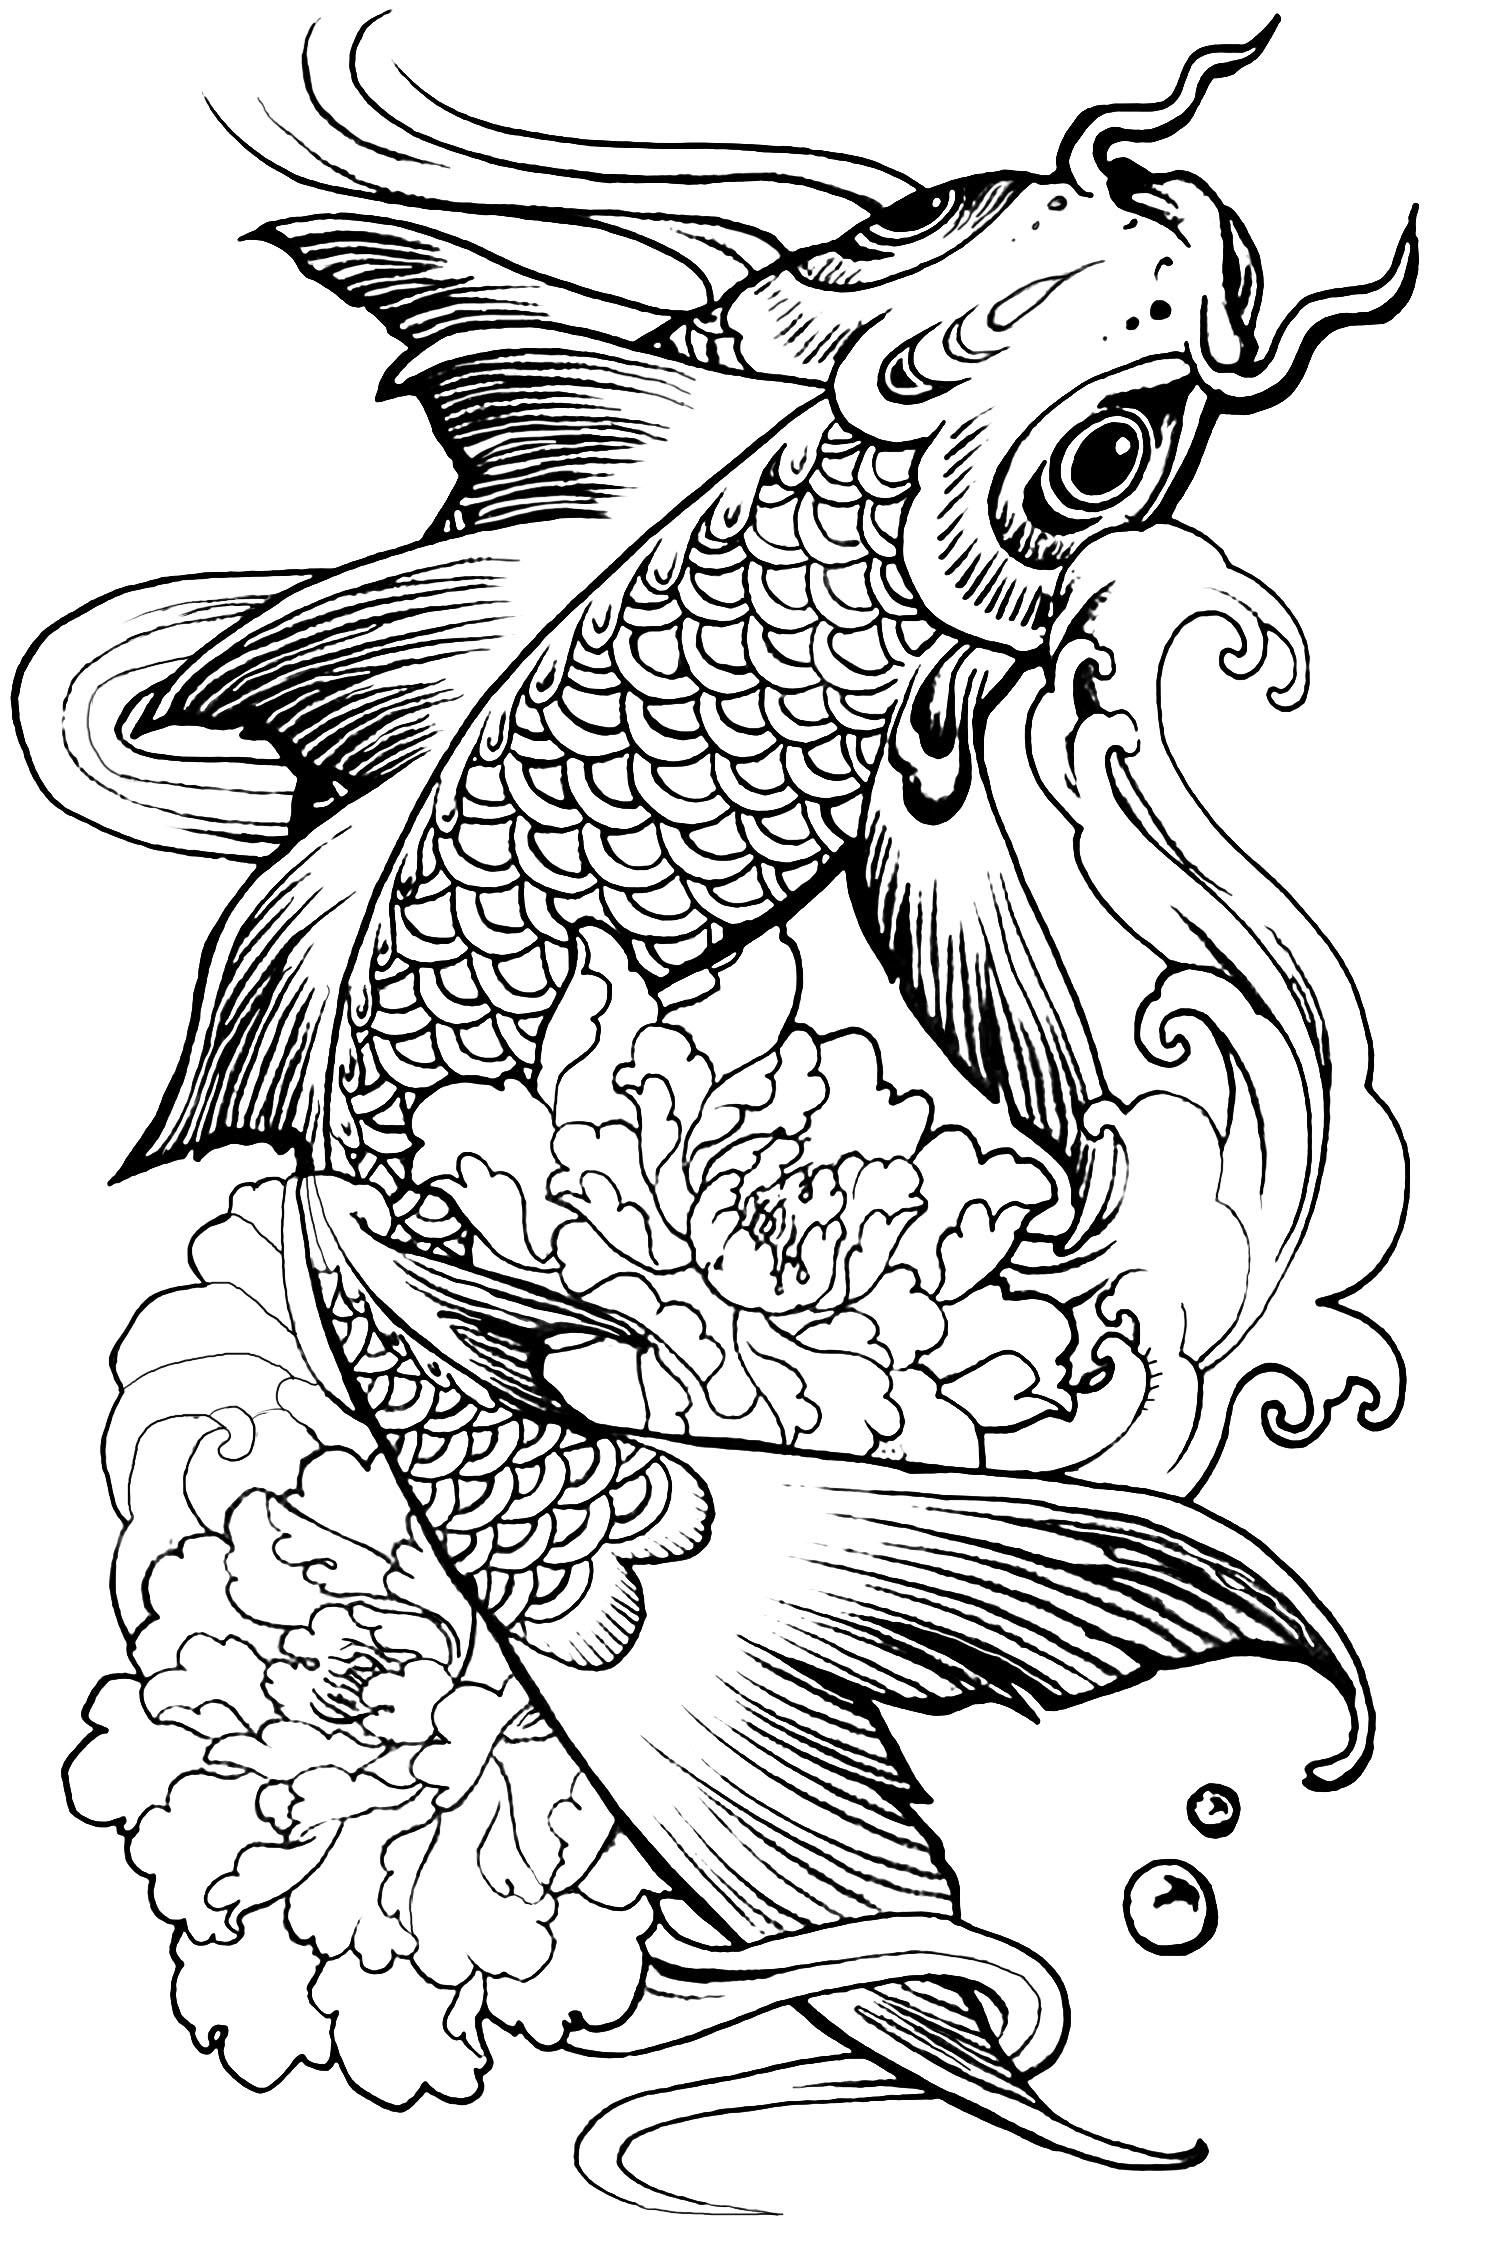 Pesci 81666 pesci disegni da colorare per adulti - Pagine da colorare pesci per adulti ...